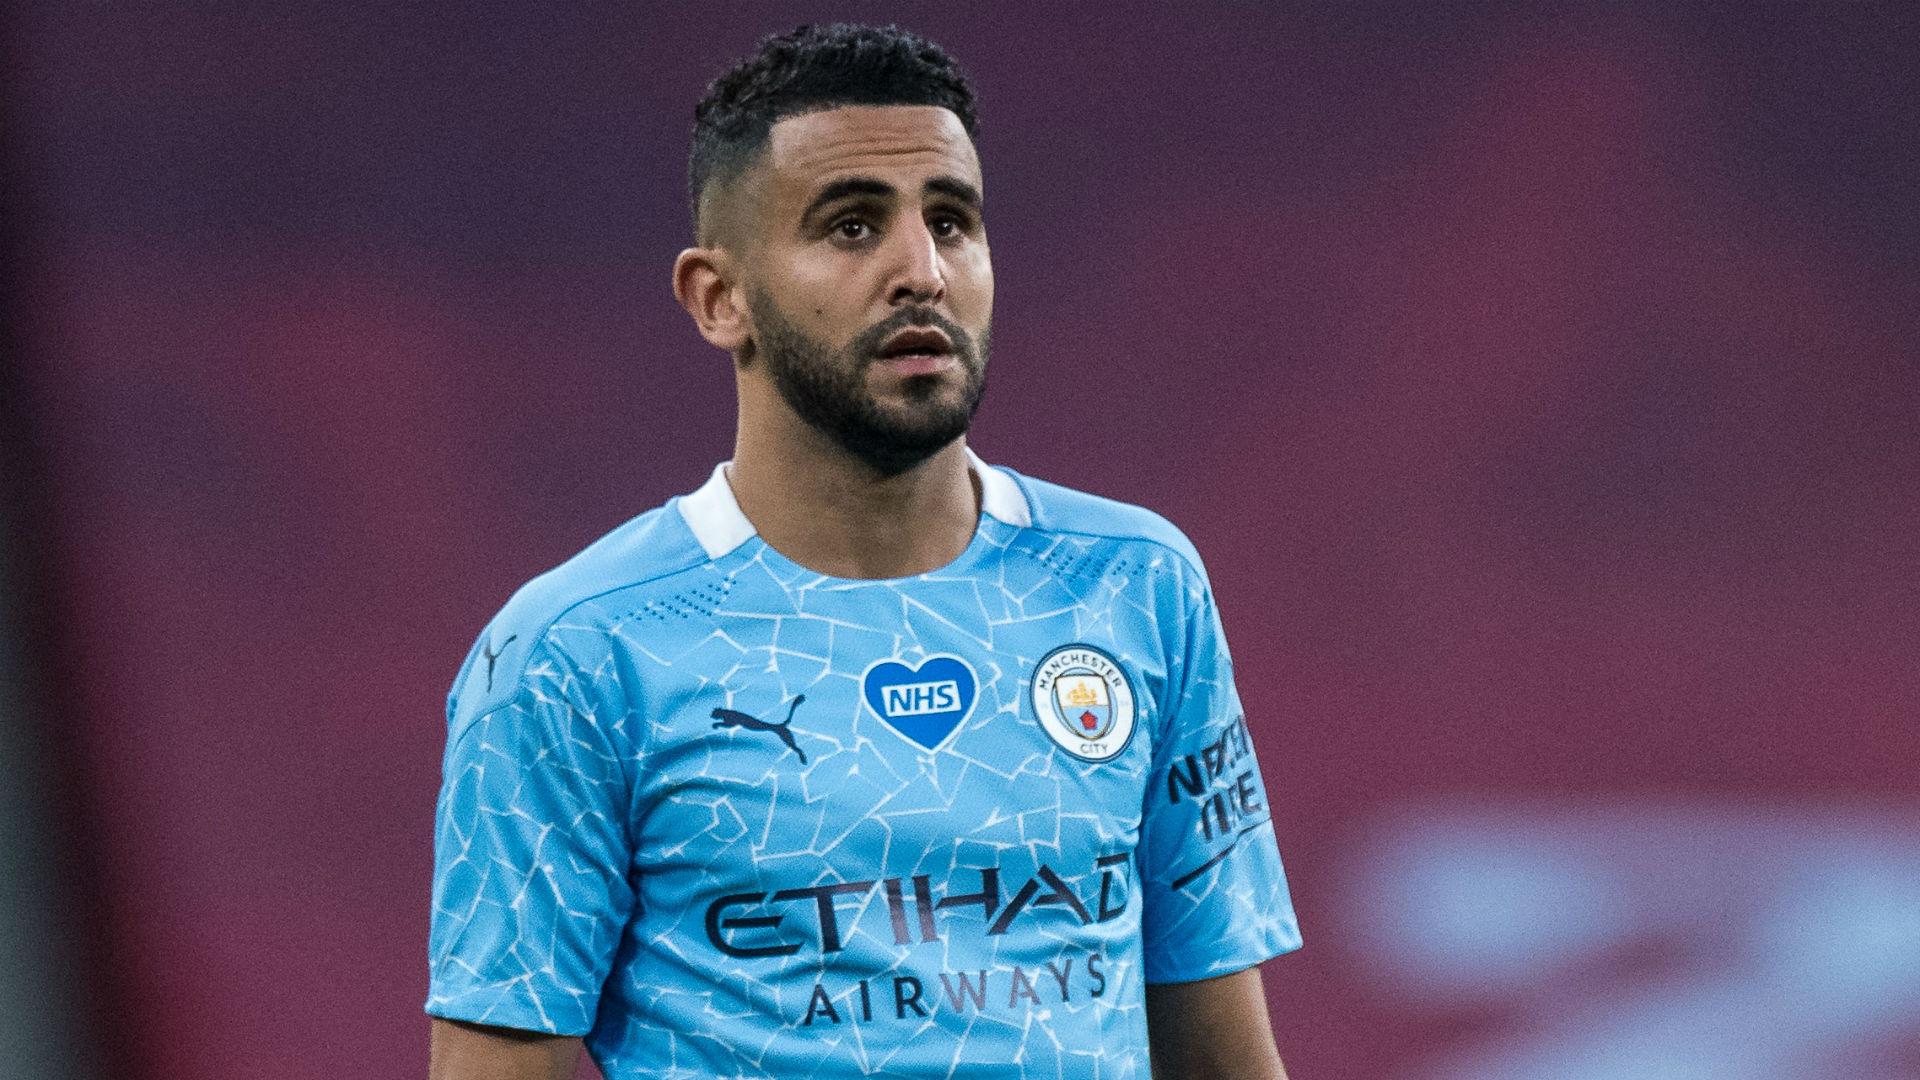 Man City duo Mahrez and Laporte test positive for coronavirus